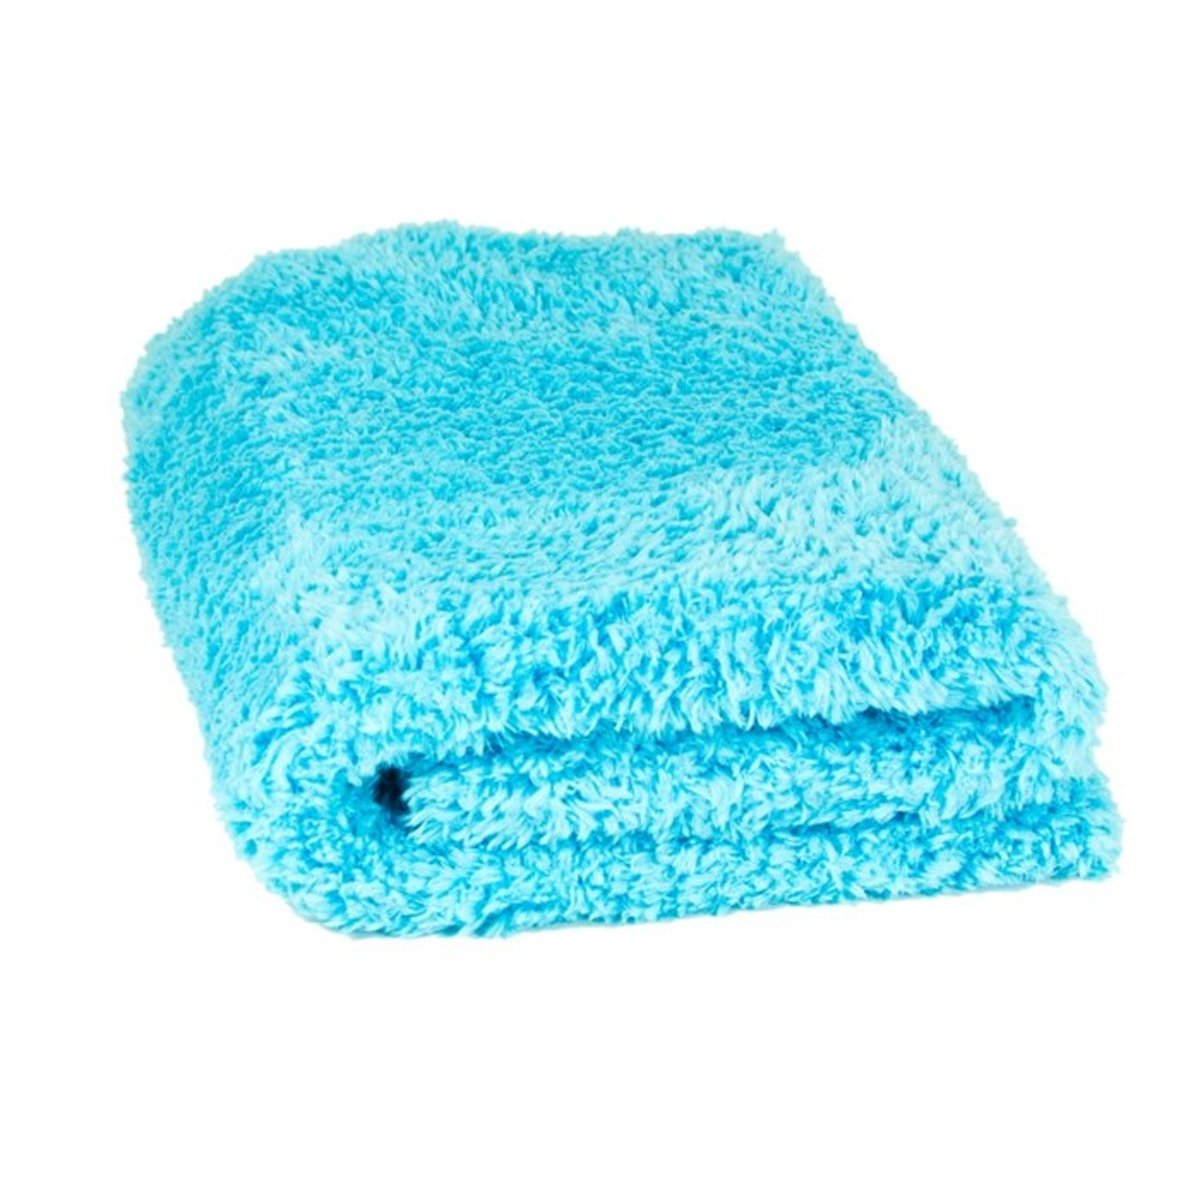 Microfiber Madness Crazy Pile 500g/m2 Microfiber Towel - 40x40cm kopen